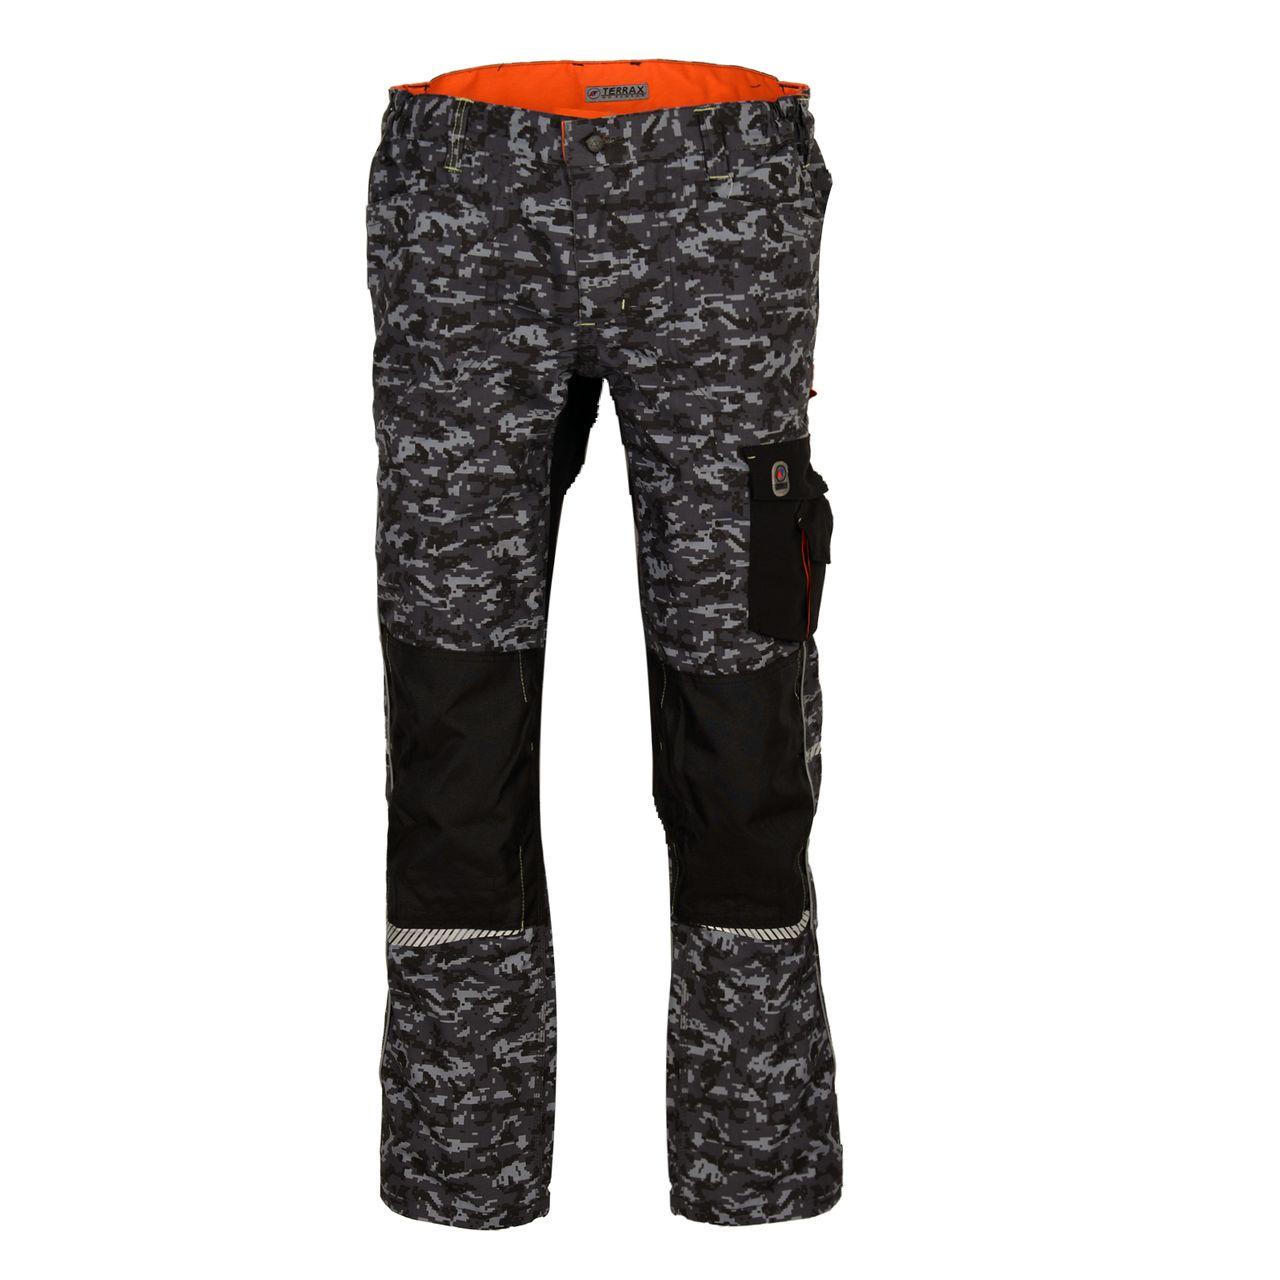 TERRAX WORKWEAR Herren Arbeitshose  Bundhose, Camouflage, Grau